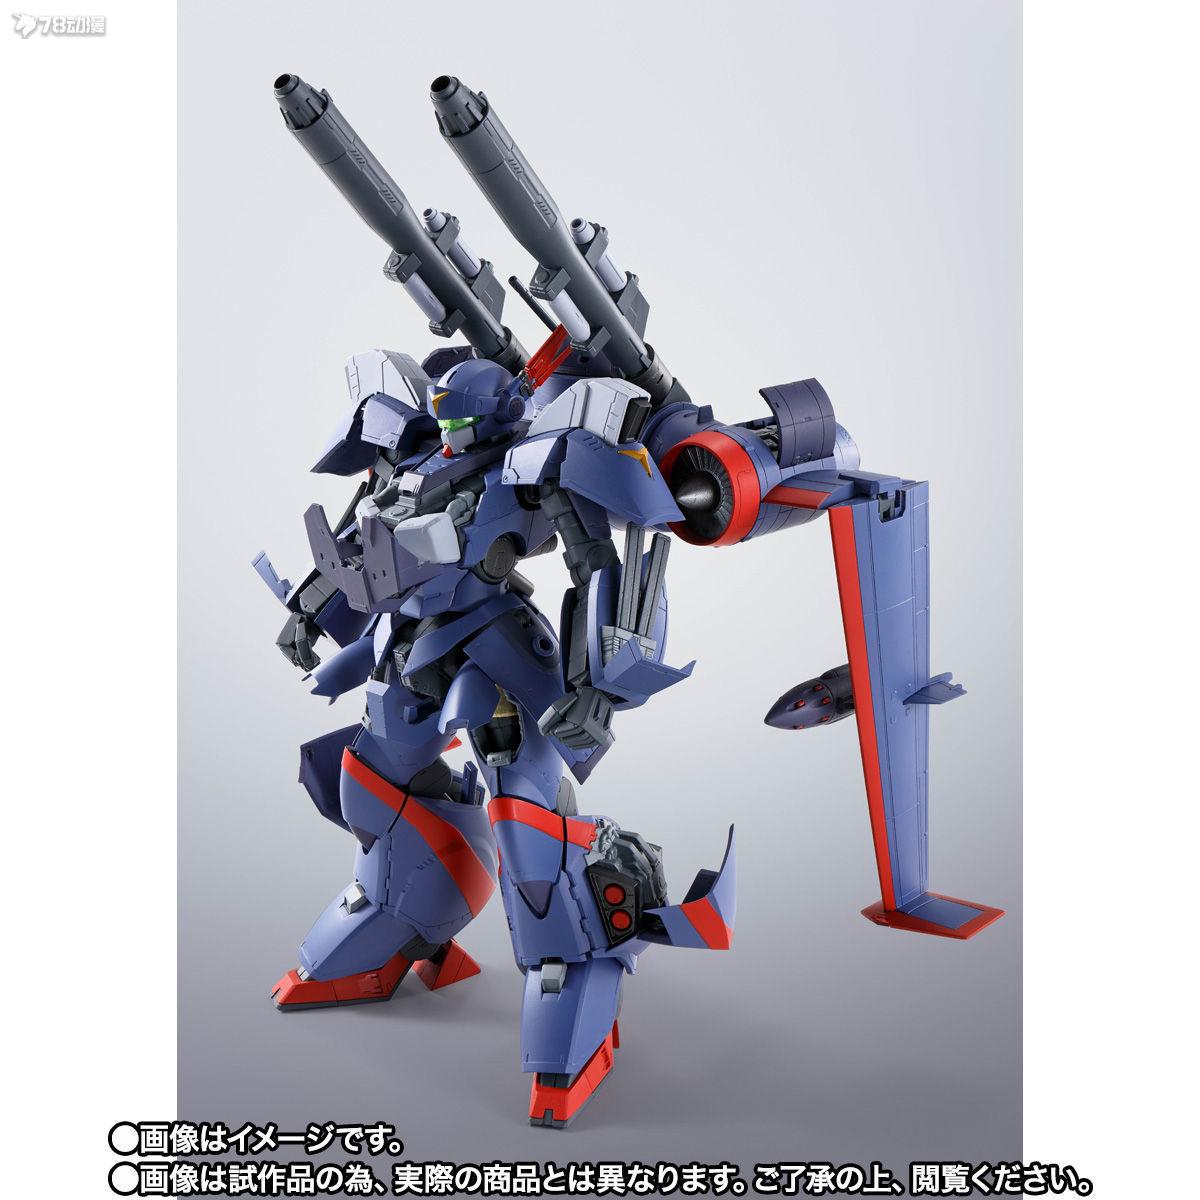 BANDAI 22年1月 魂限定 HI-METAL R 龍騎2號機 官圖更新